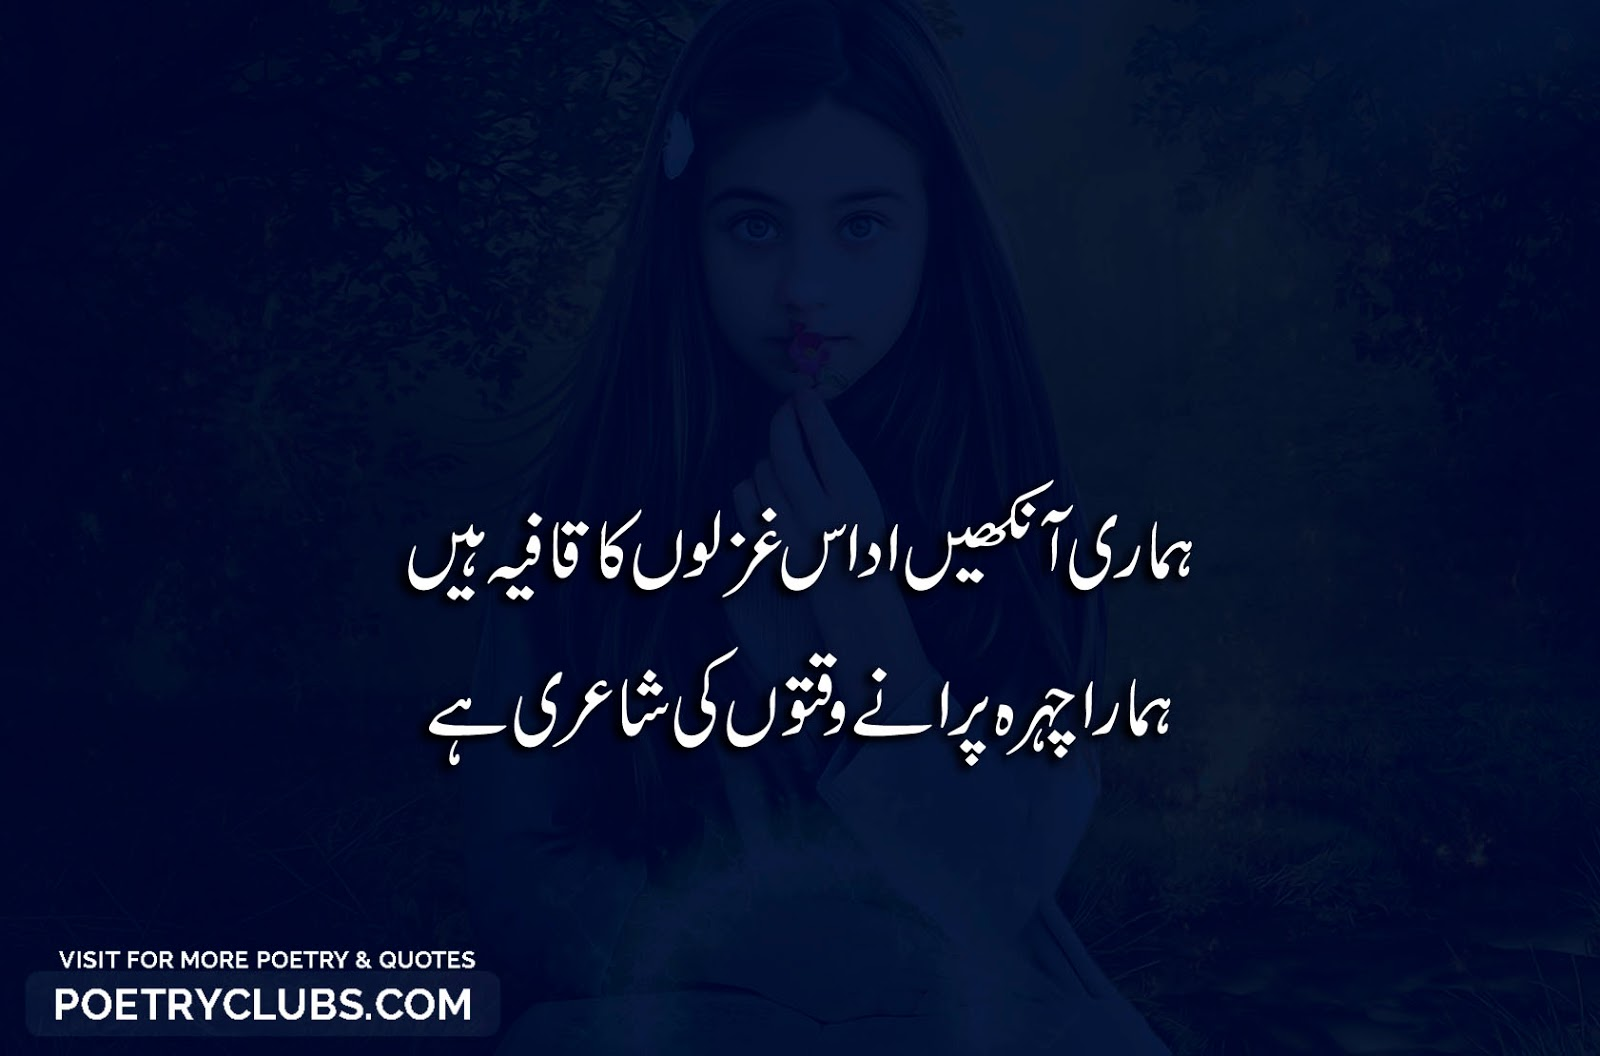 Urdu Love Poetry Quotes 2 Lines Romantic Sad Love